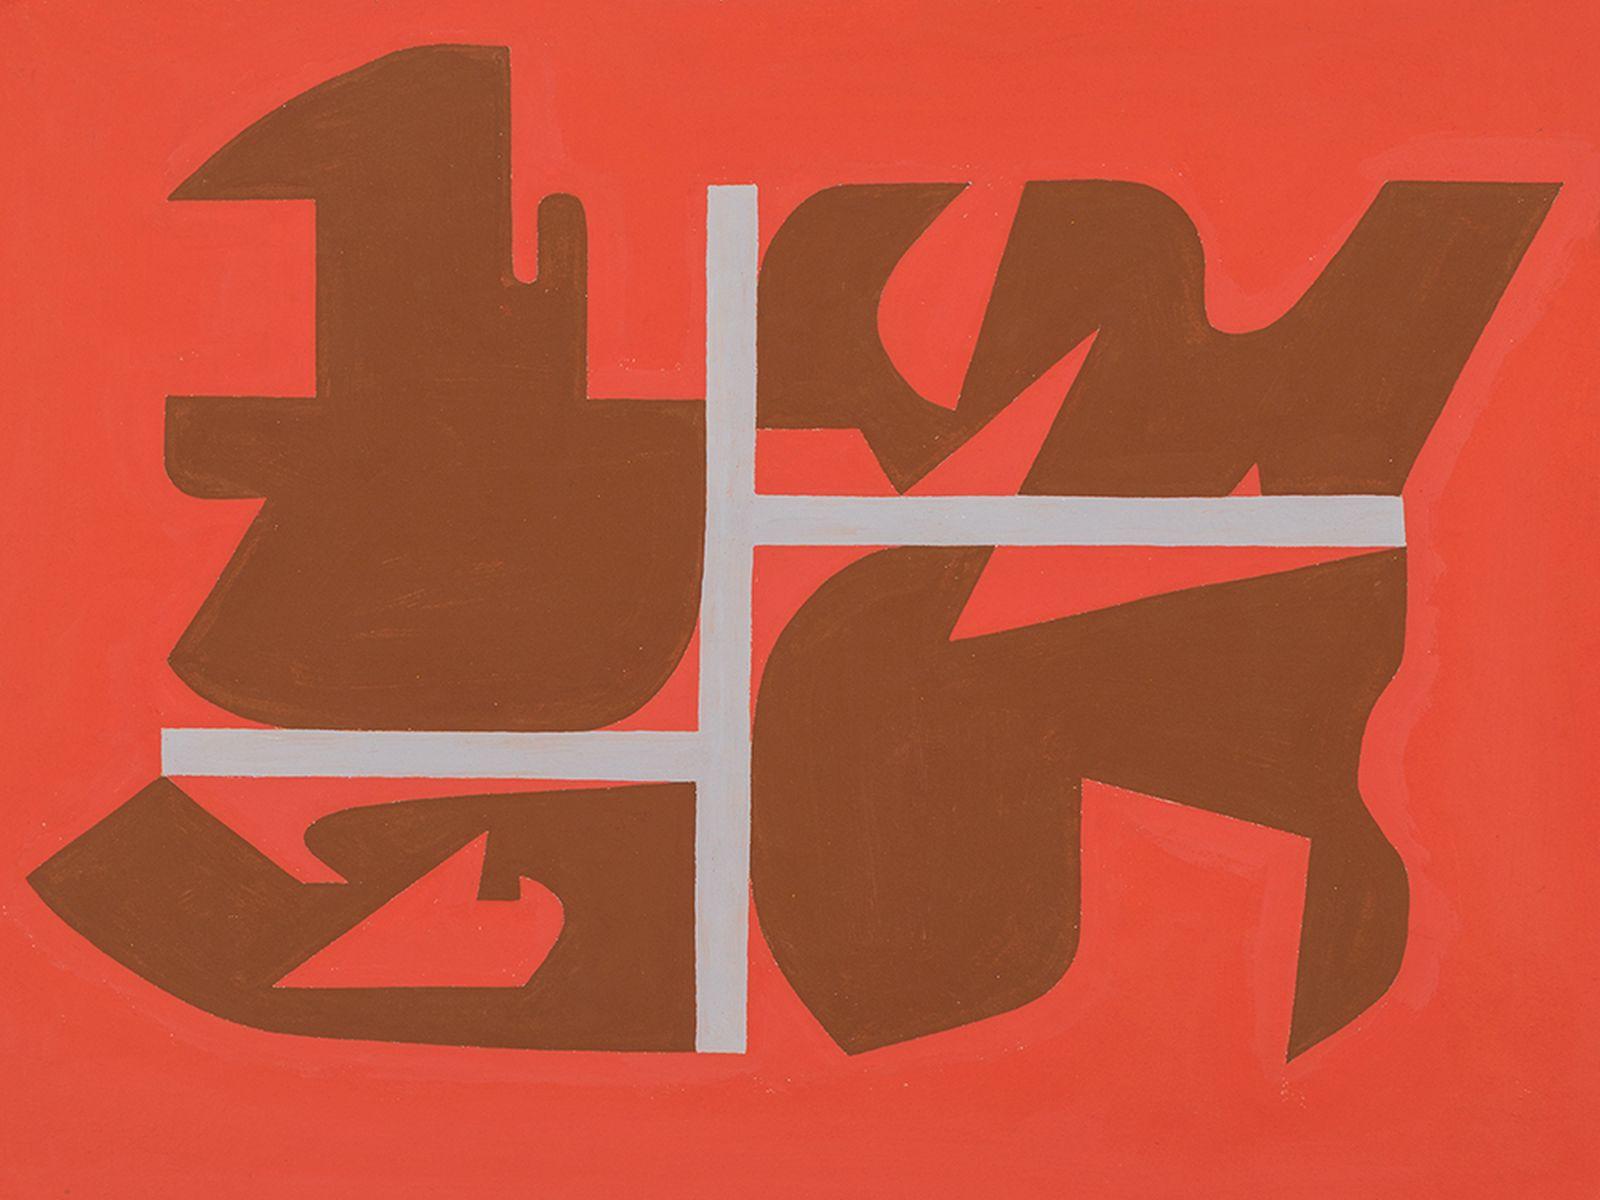 #114 Rudolf Petrik, Abstract Composition, Gouache, Austria, c. 1955 | Rudolf Petrik, Komposition in Rot und Grau, Gouache, ca.1955 Image